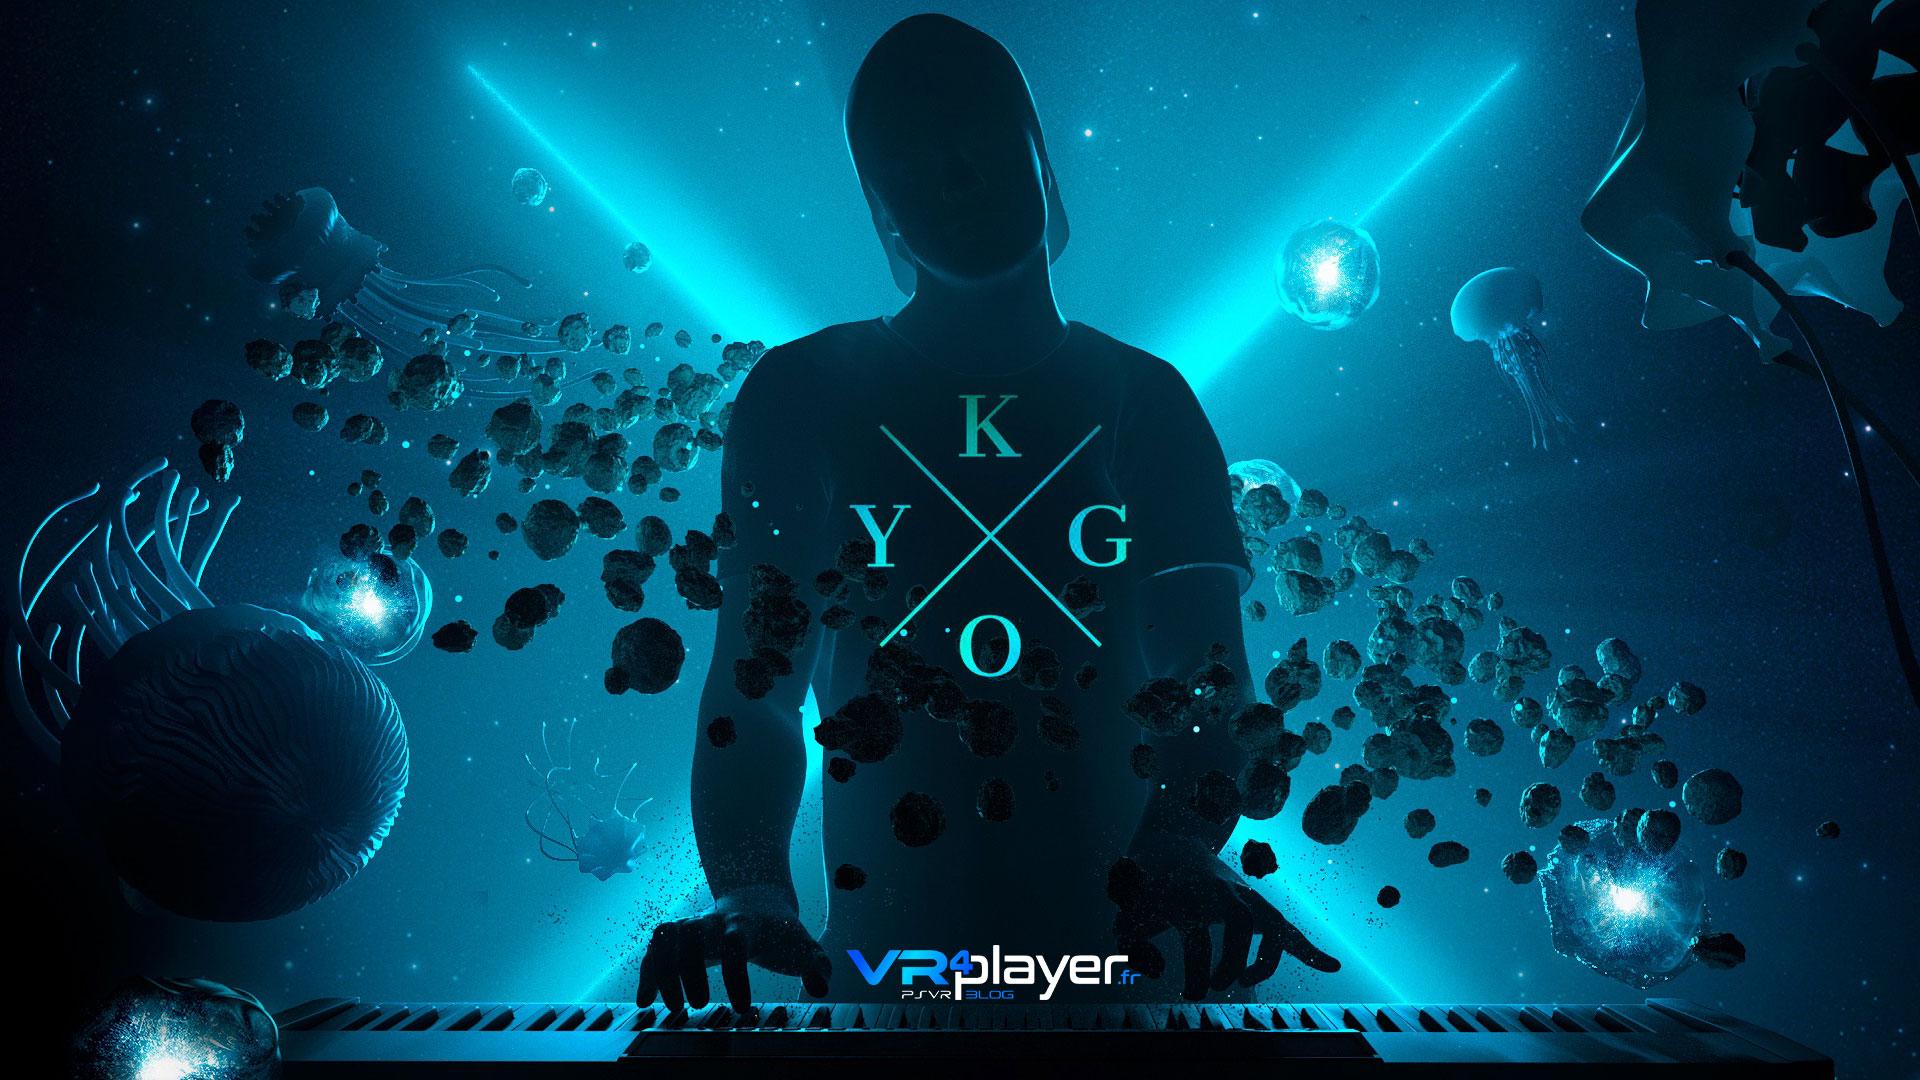 Kygo le 11 avril sur le Store PSVR vrplayer.fr